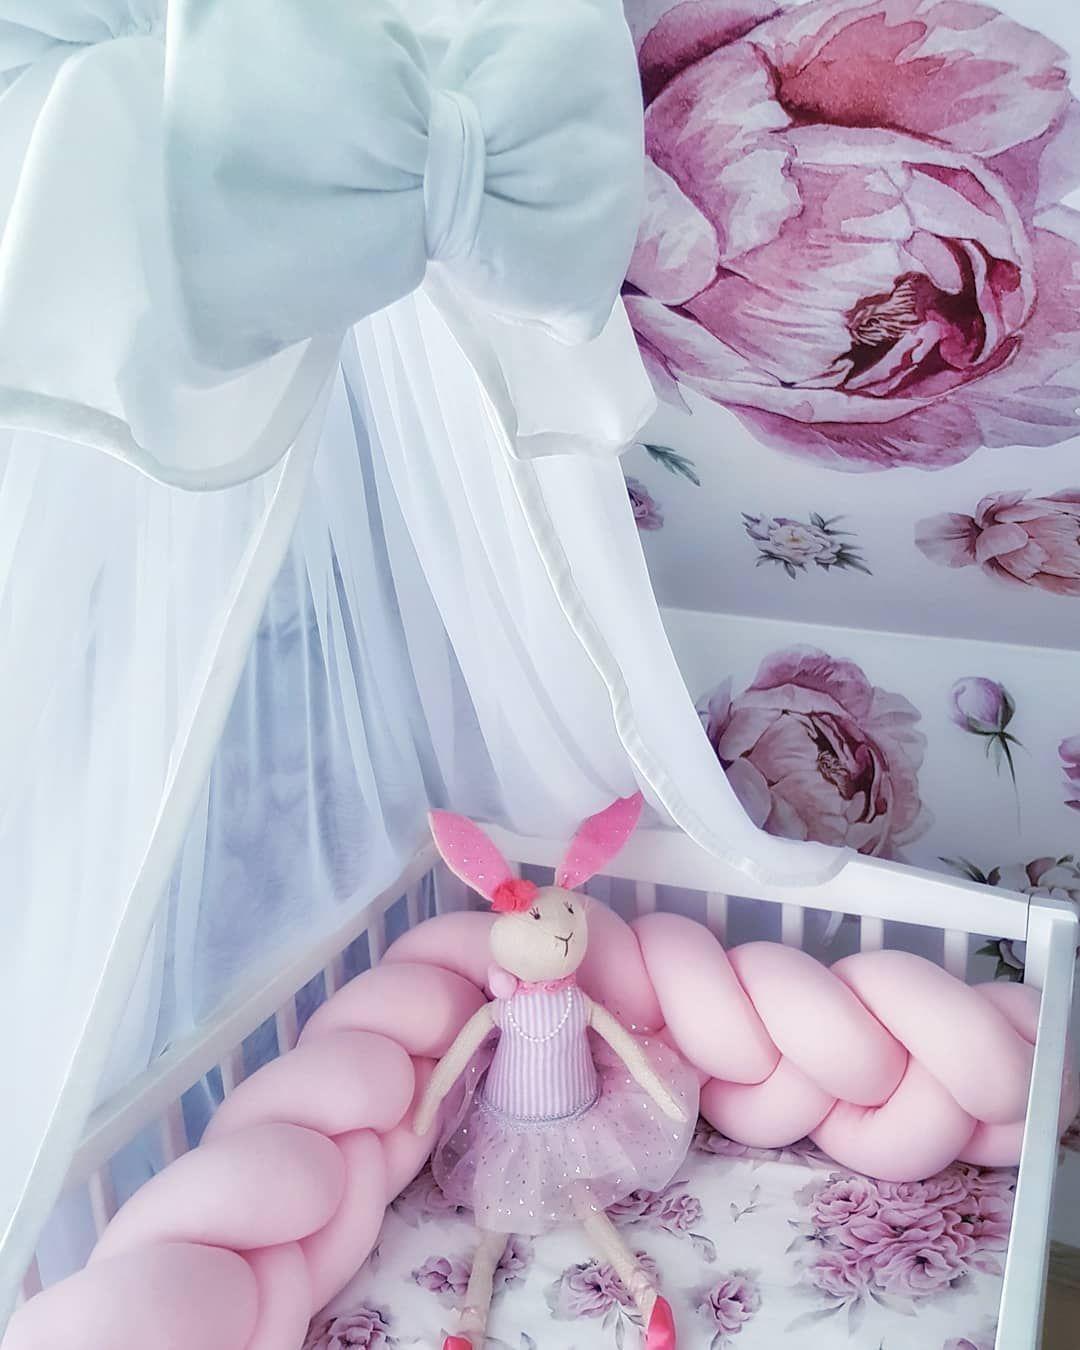 Kidsroom Bed Bedroom Sweet Interior Homedesign Kid S Bed With